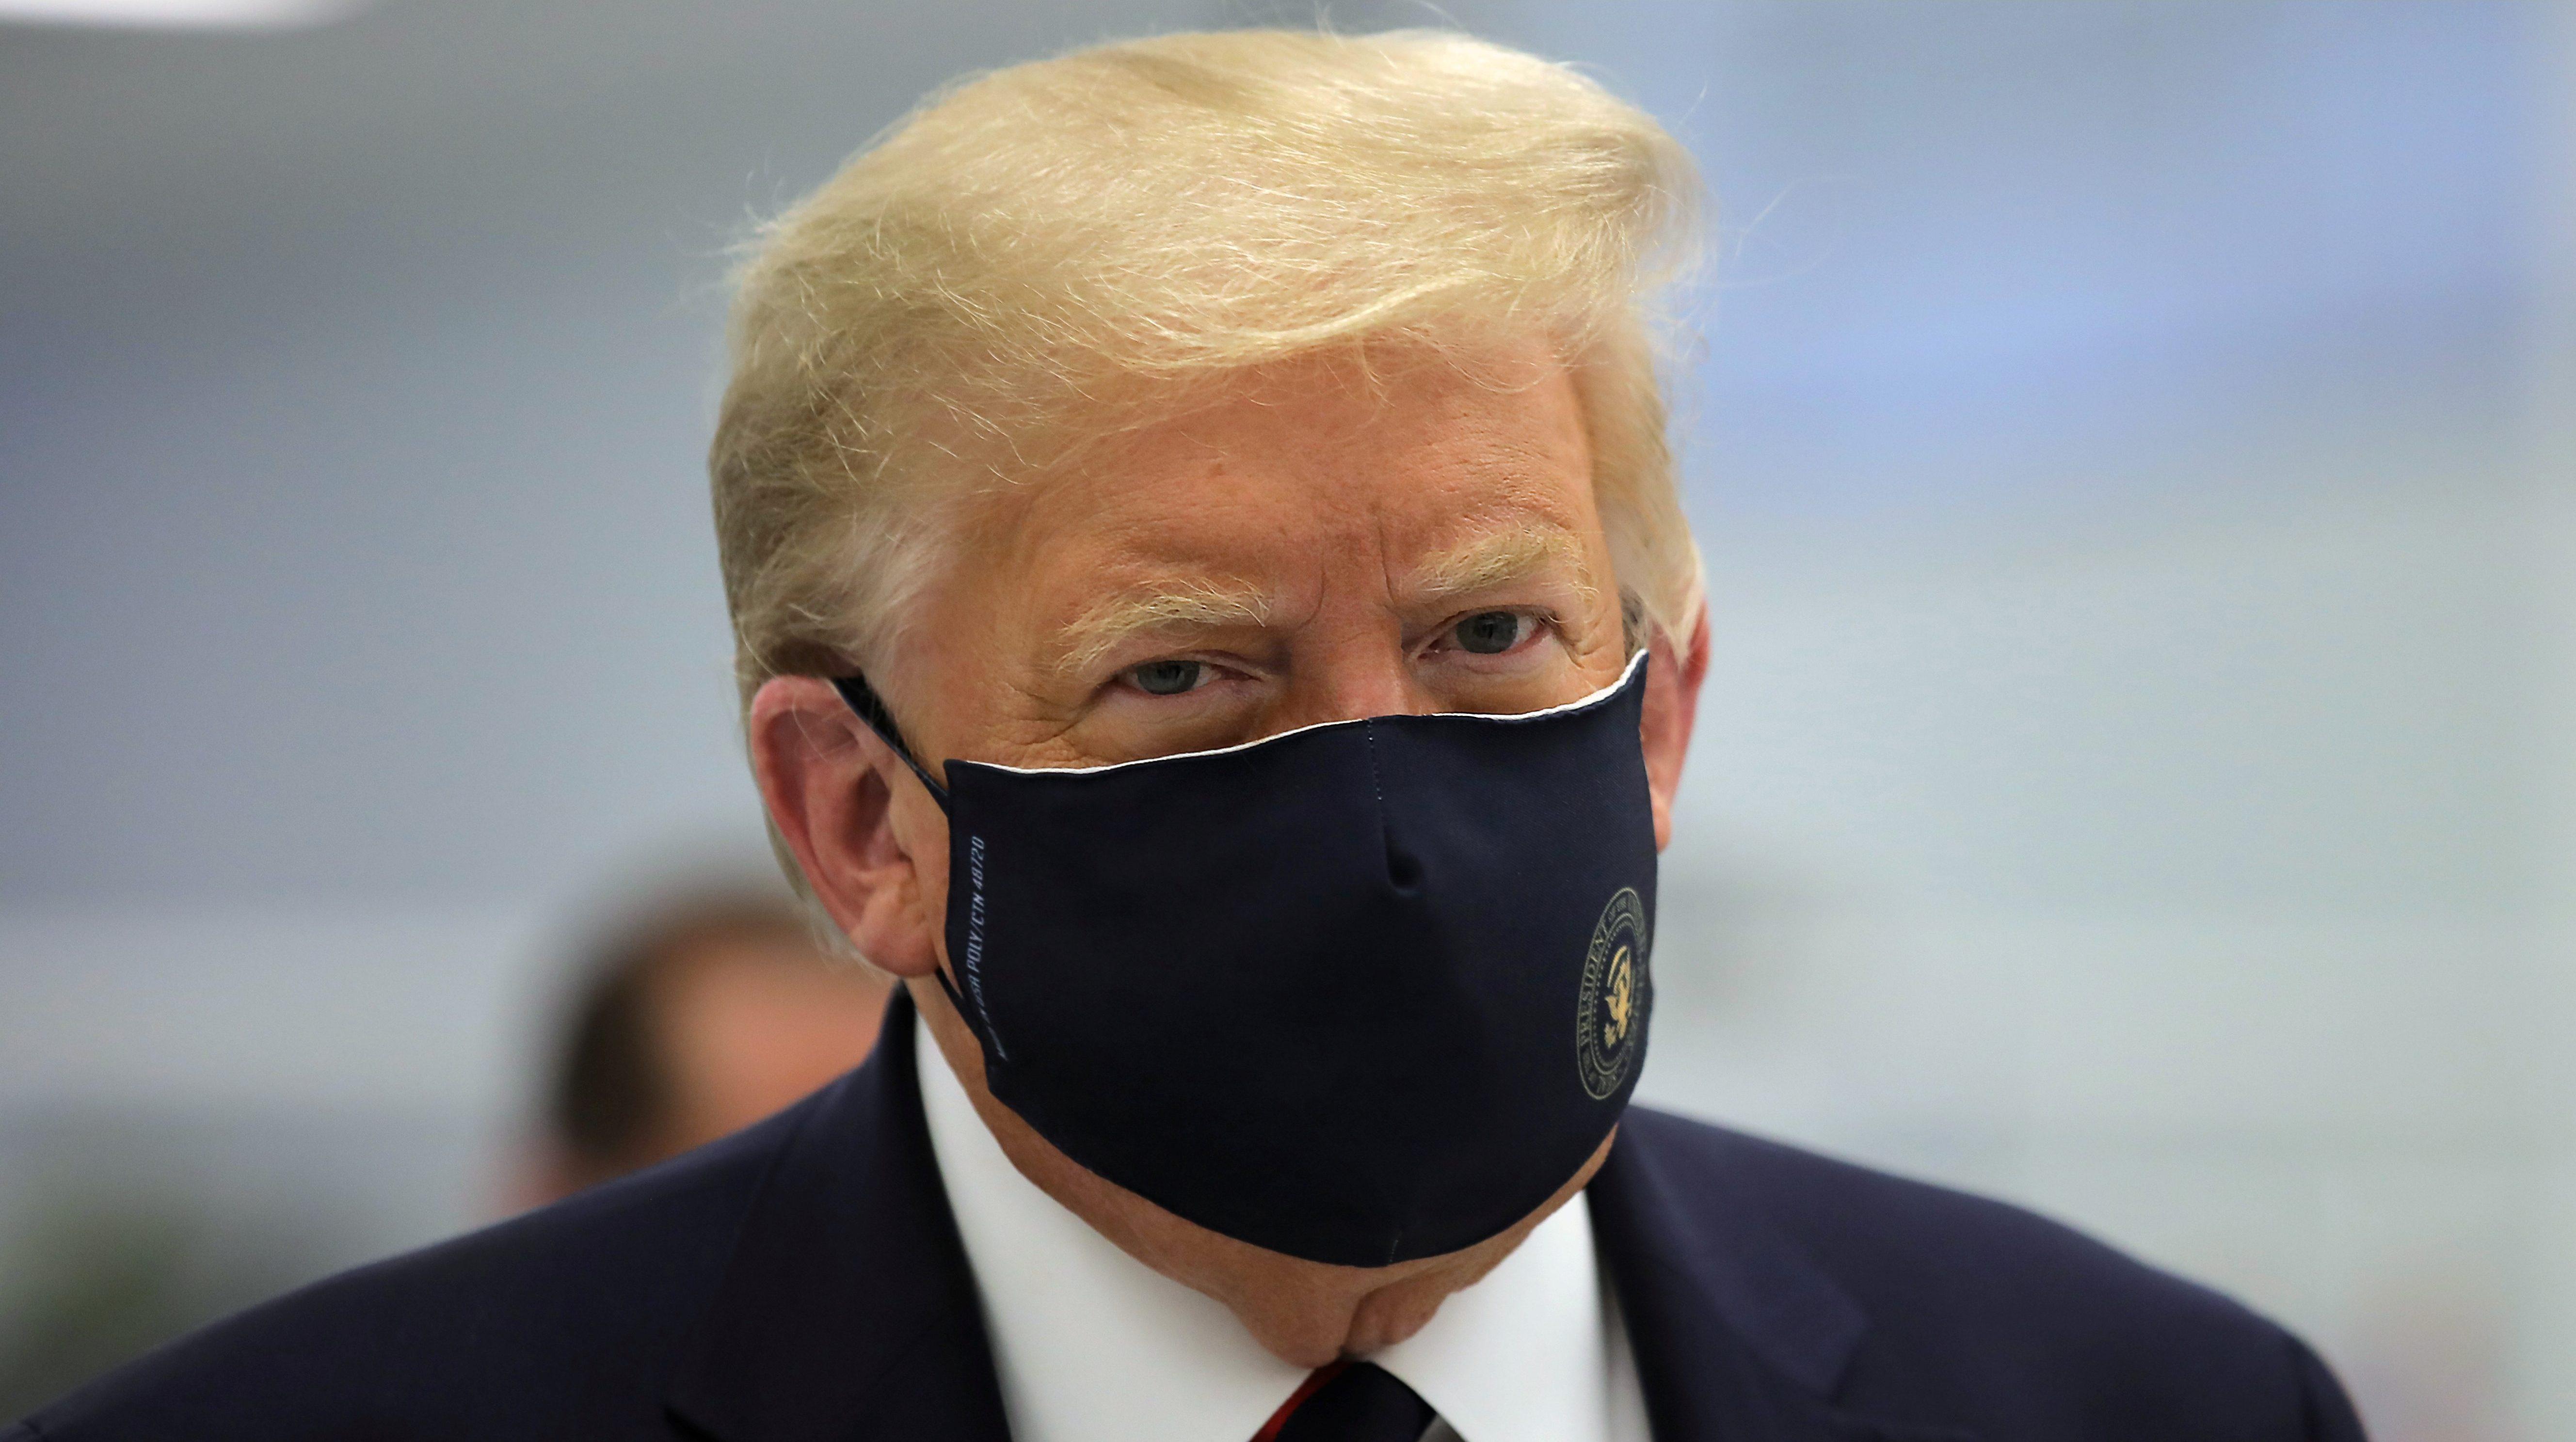 Donald Trump wears a mask